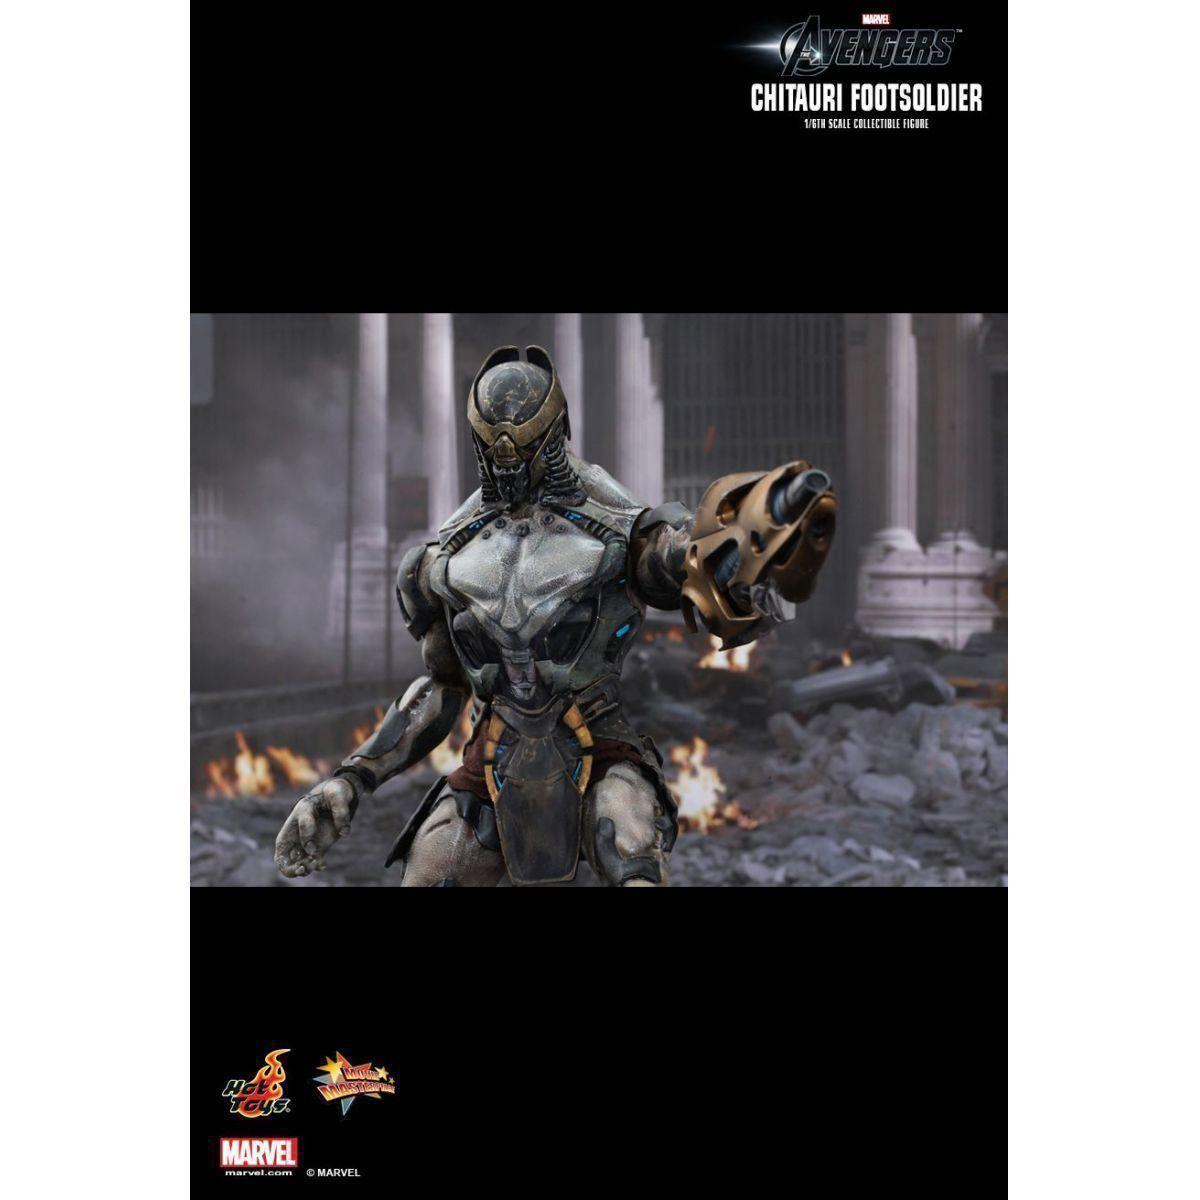 Boneco Chitauri Footsoldier:  Os Vingadores (The Avengers) Movie Masterpiece Escala 1/6 - Hot Toys - CD